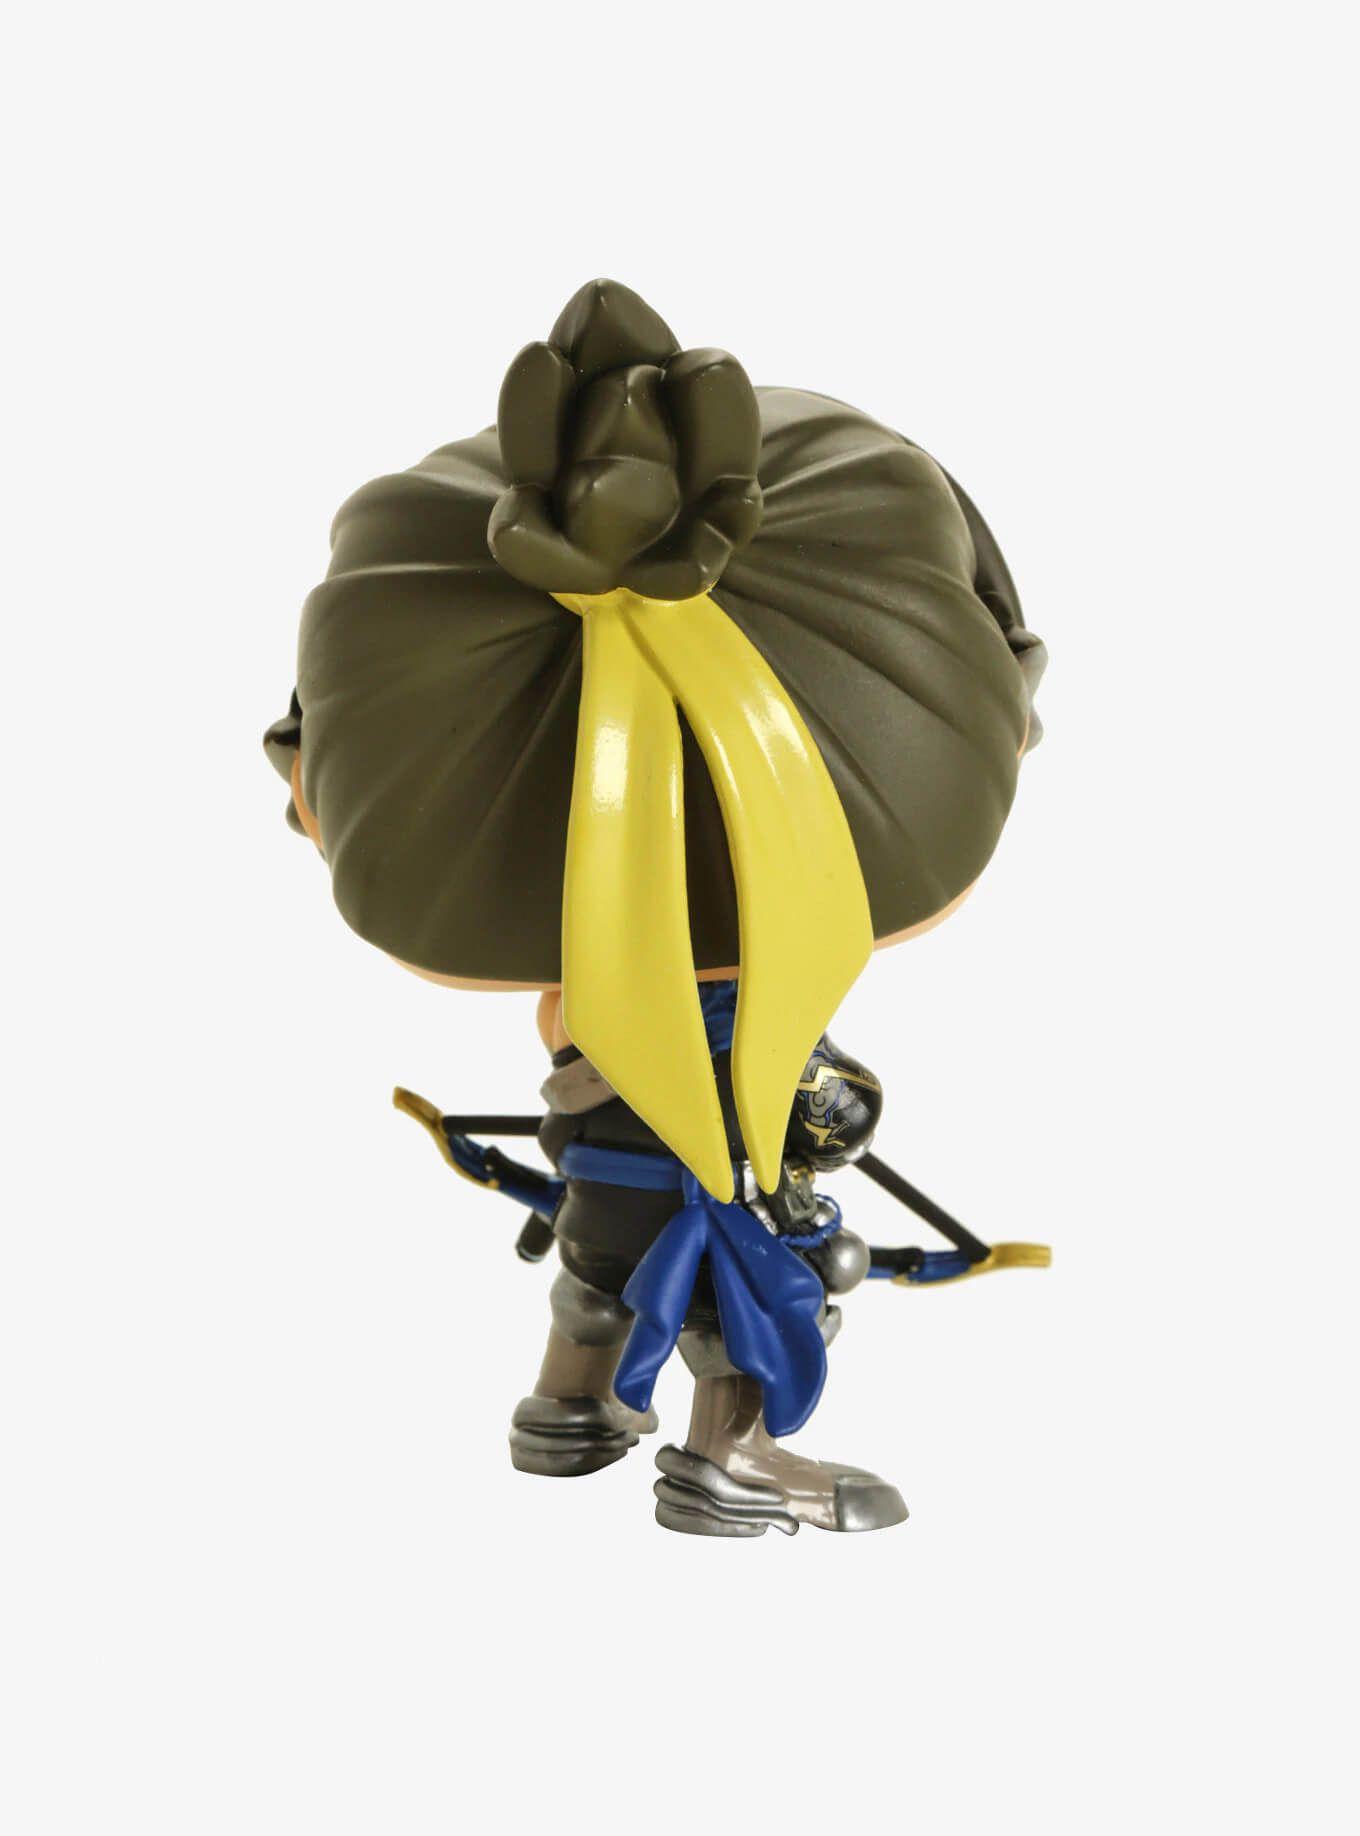 Hanzo #348 - Overwatch - Funko Pop! Games